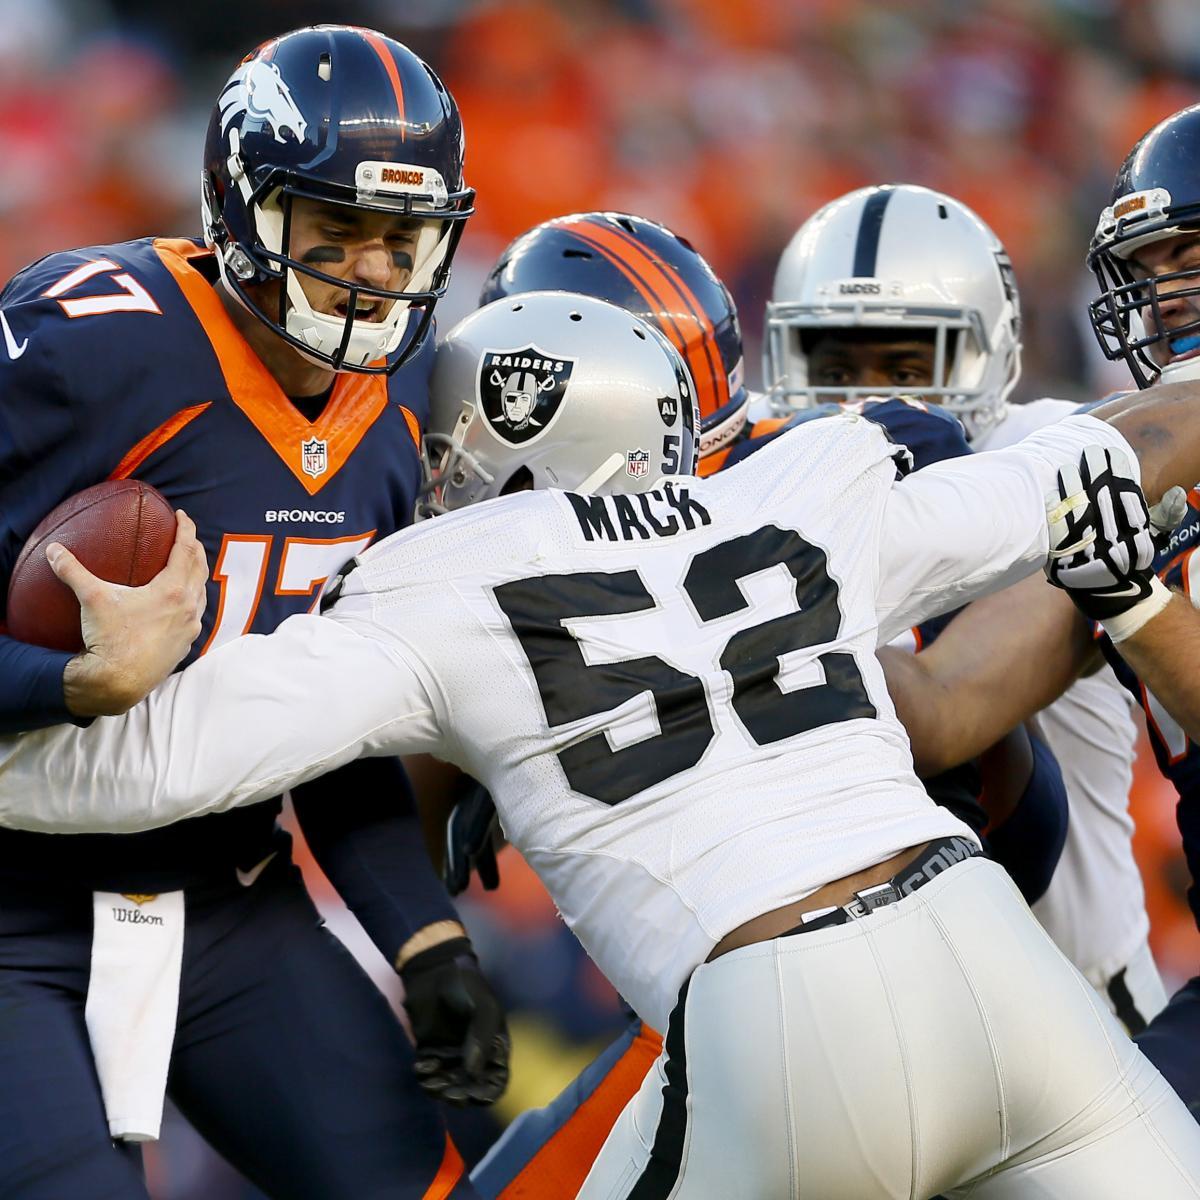 Oakland Raiders Vs. Denver Broncos: Video Highlights And